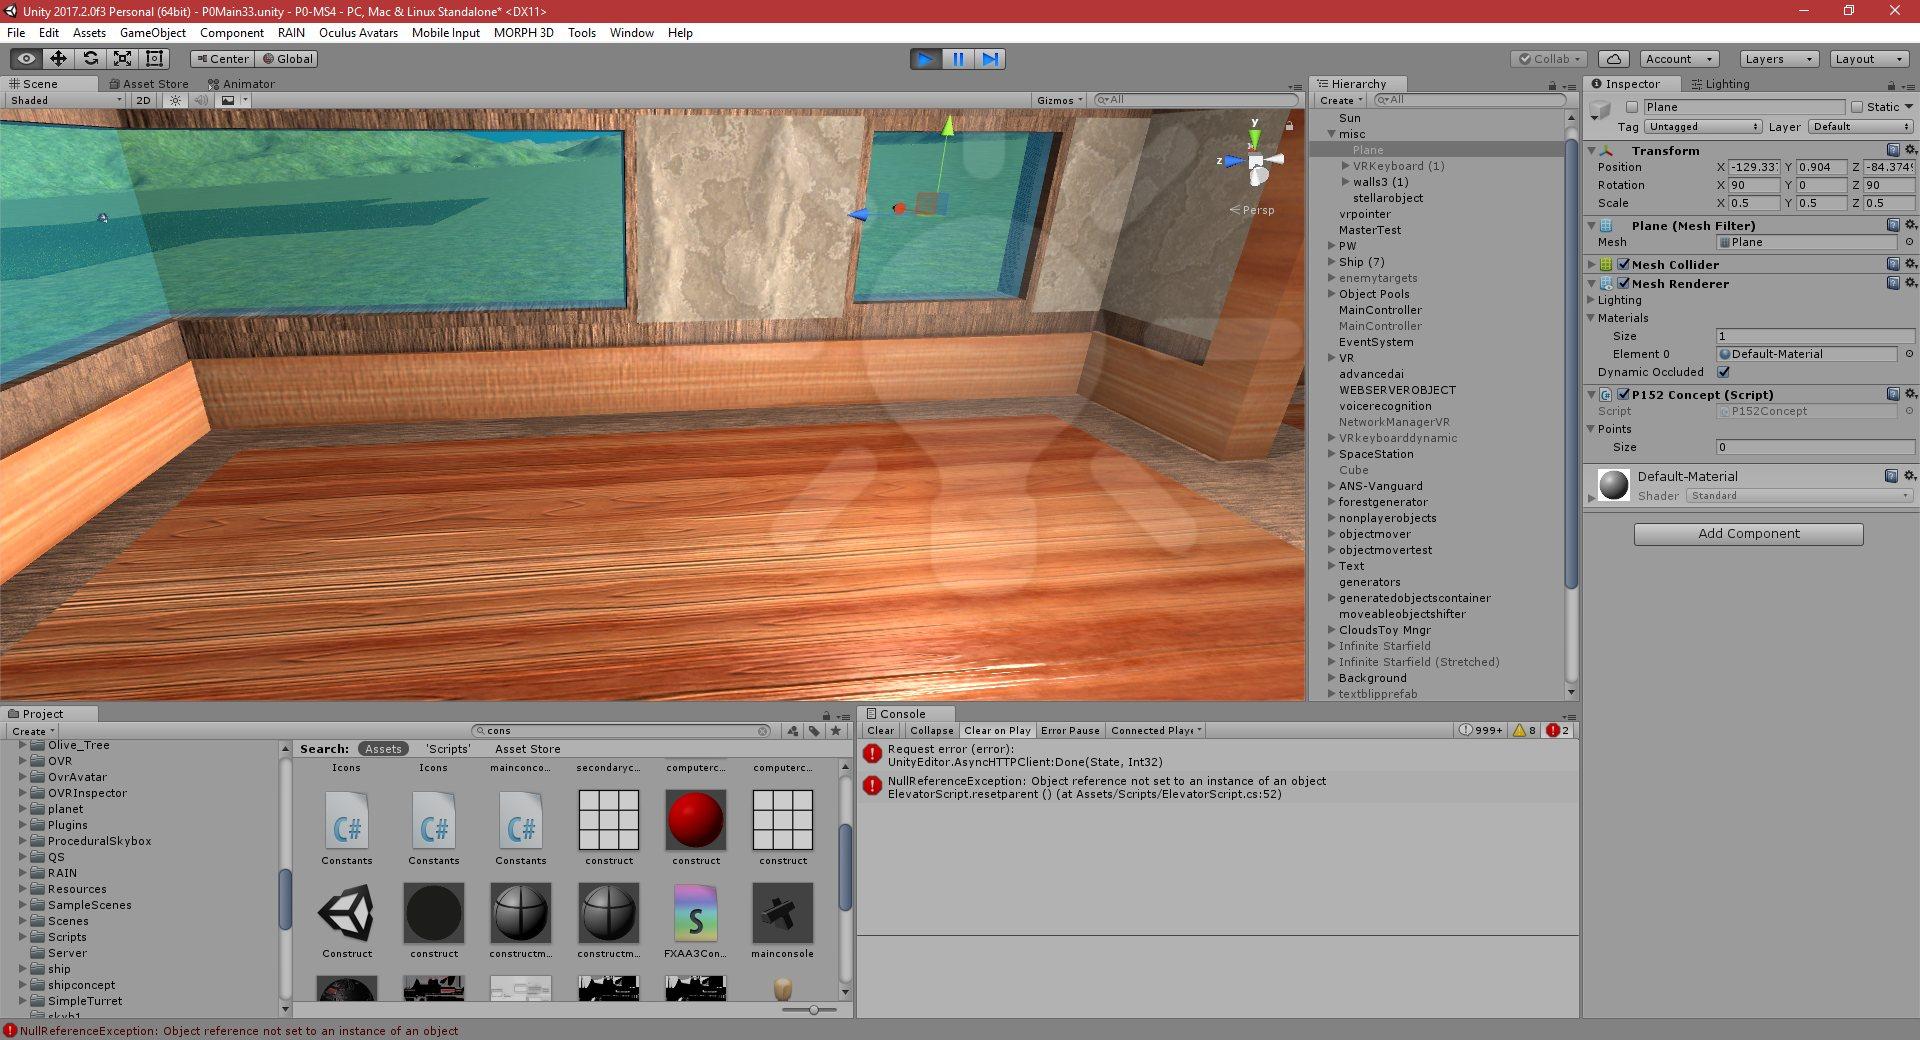 P0-MS5: Part 302: City Simulator - PGD Home